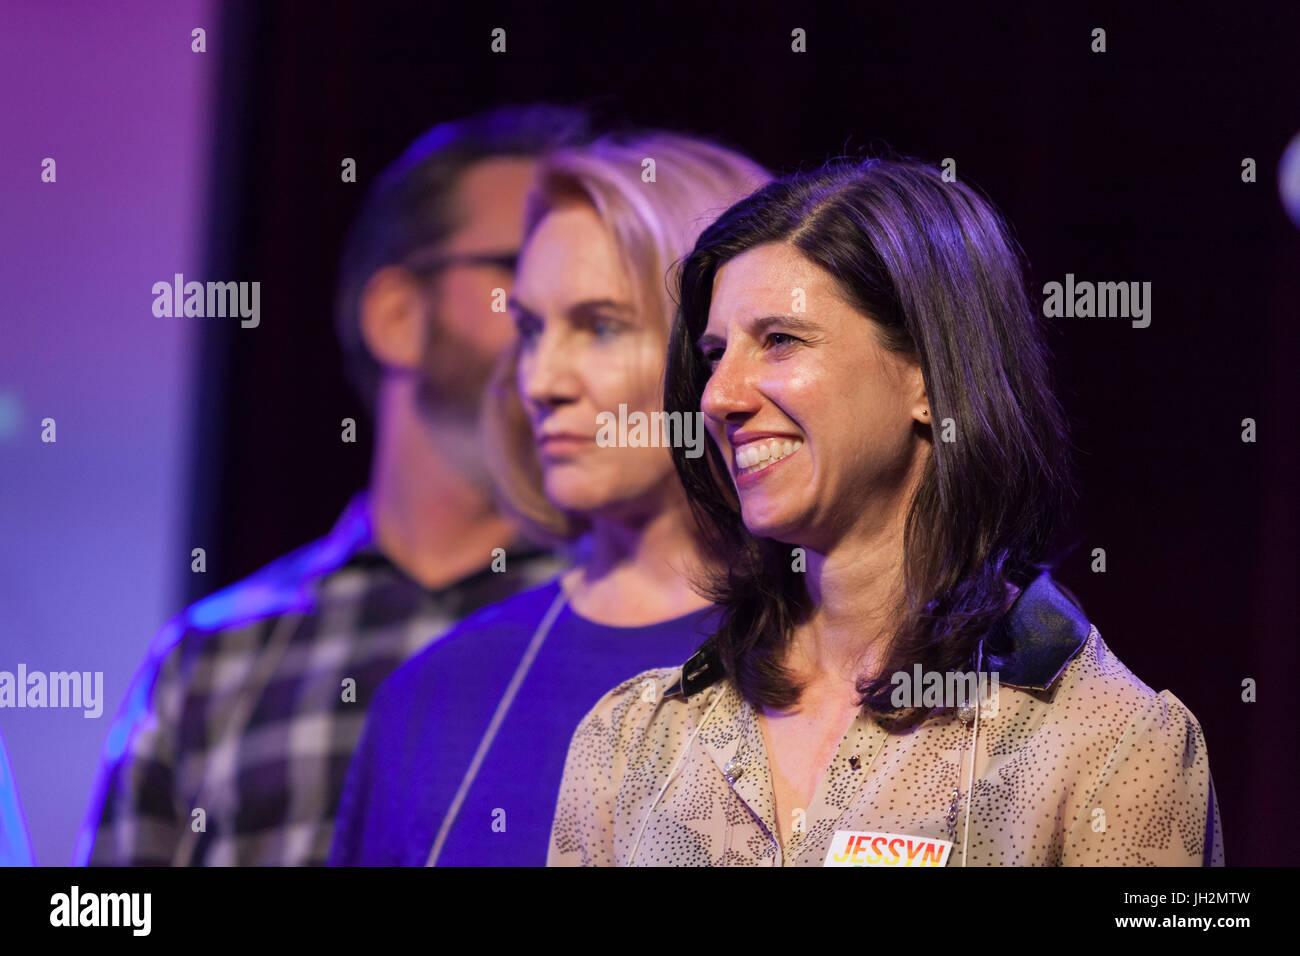 Seattle, Washington, USA. 11th July, 2017. Jessyn Farrell, Jenny Durkan and  Jason Robert at Candidate Survivor Stock Photo